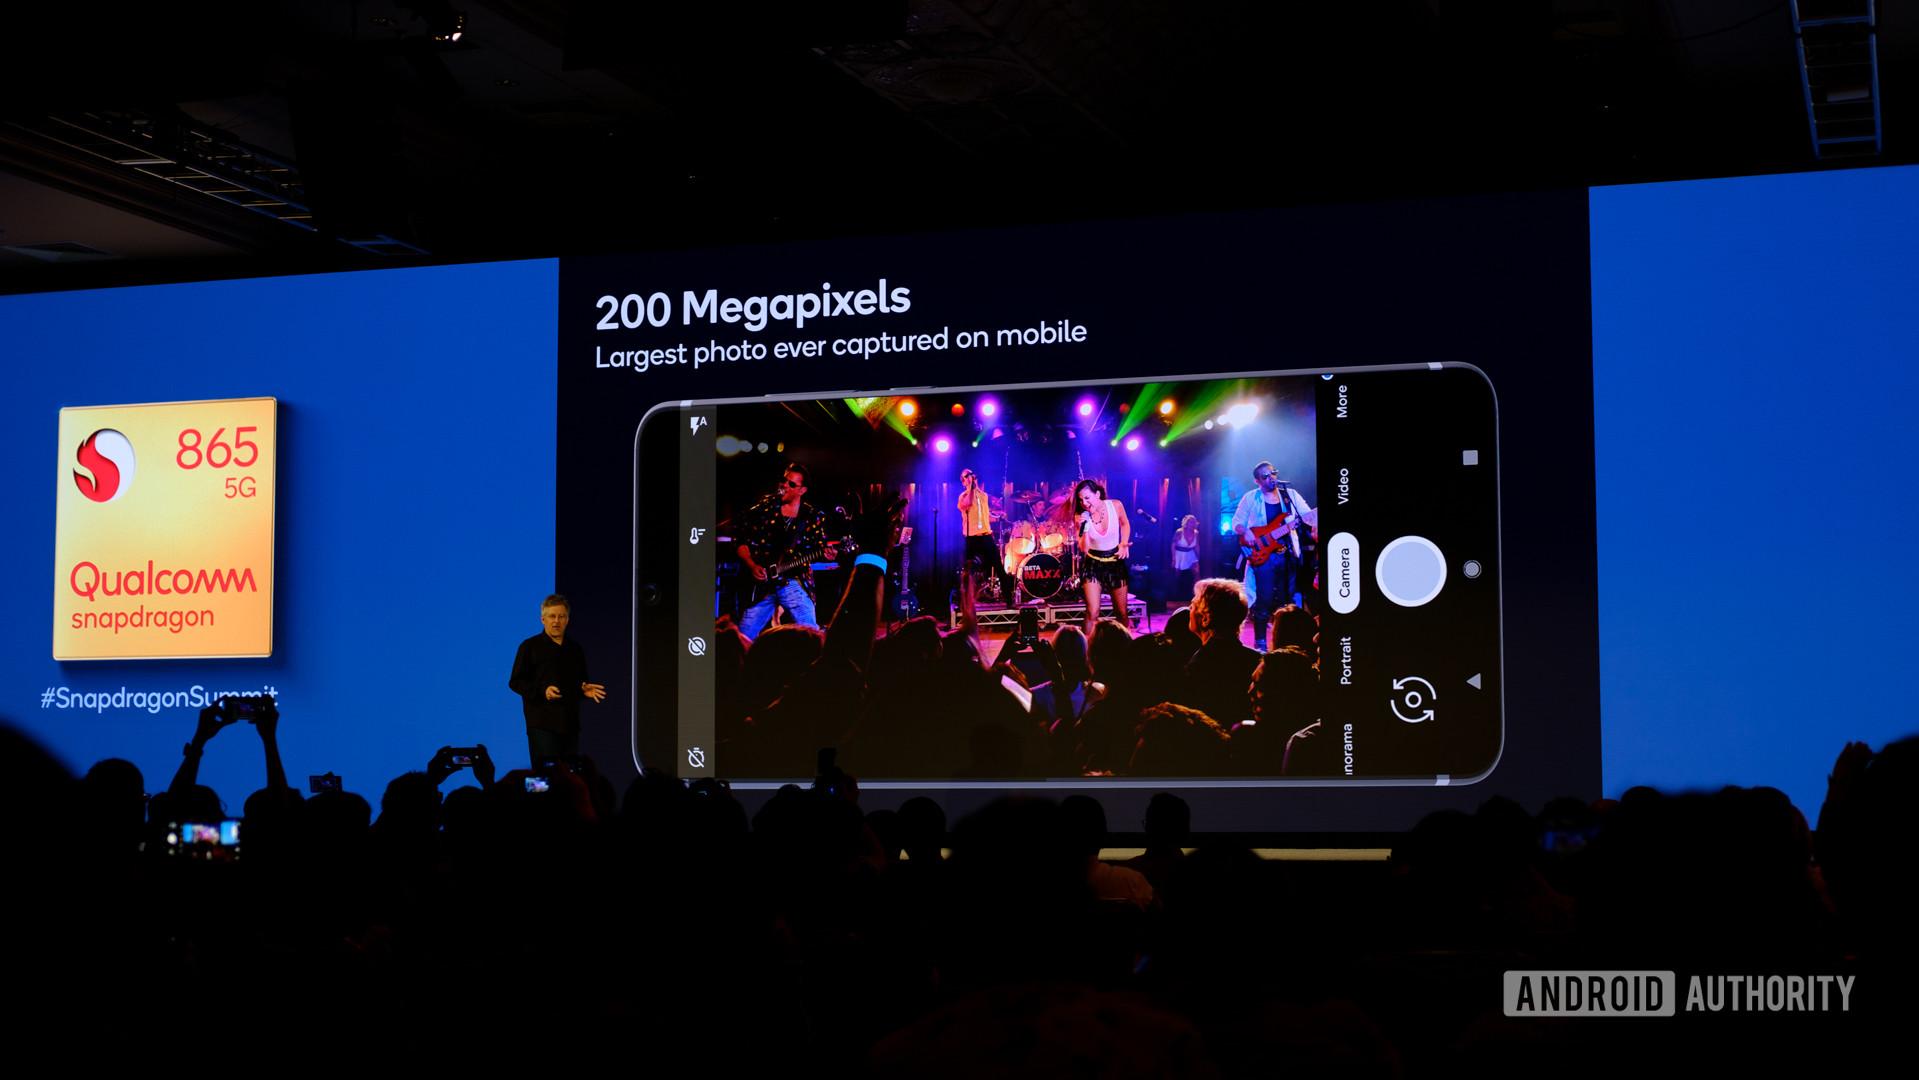 Qualcomm Snapdragon 865 200MP slides